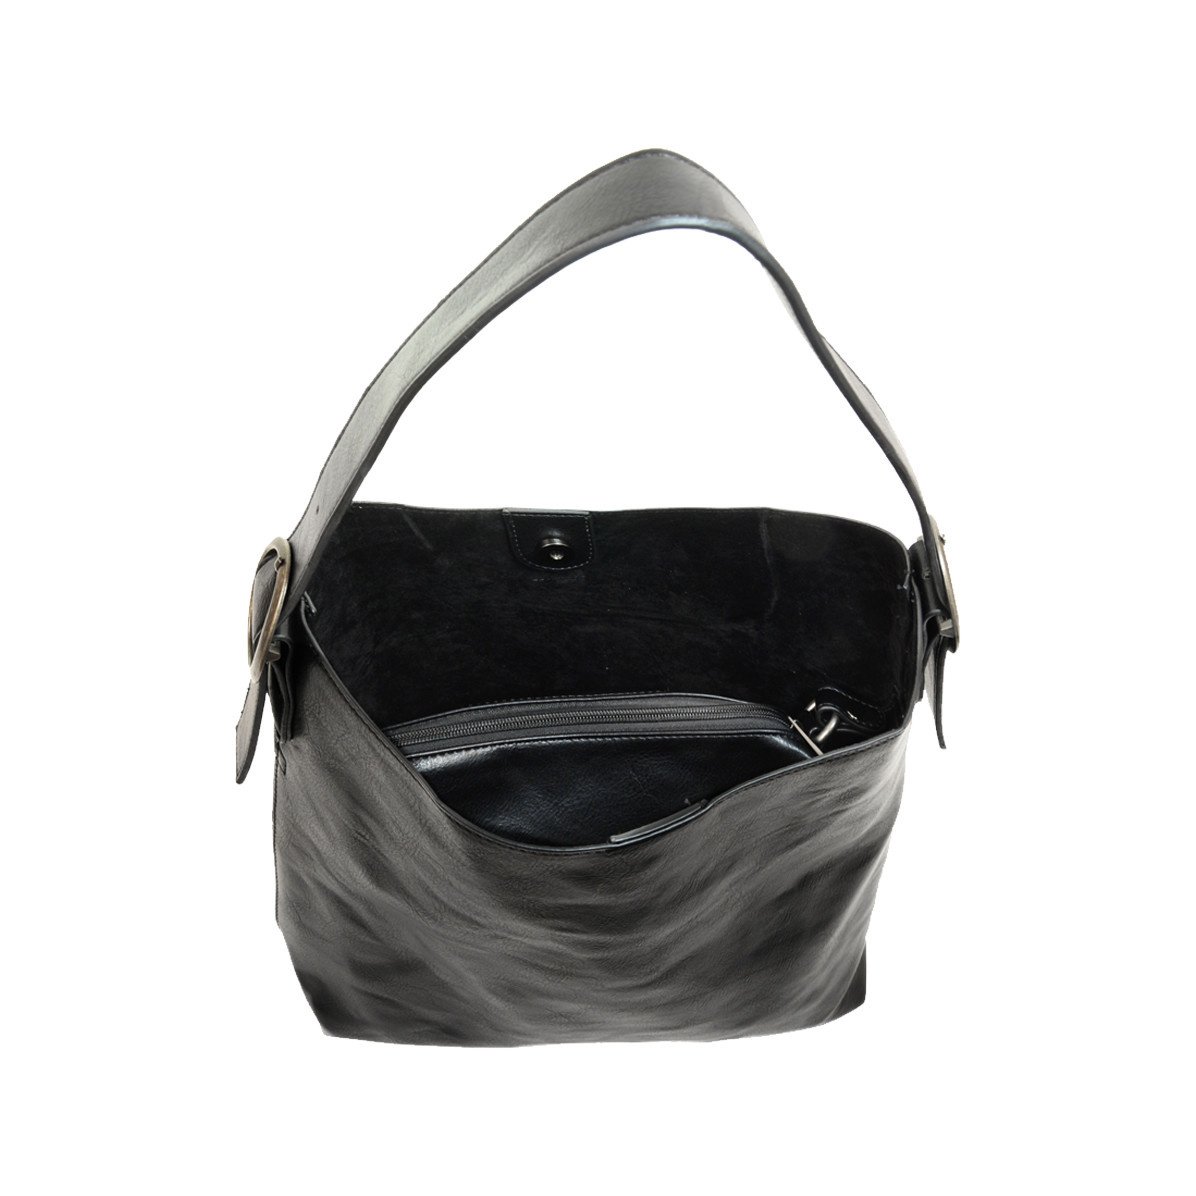 Joy Susan Joy Susan Jillian Hobo Handbag with Tassel Black